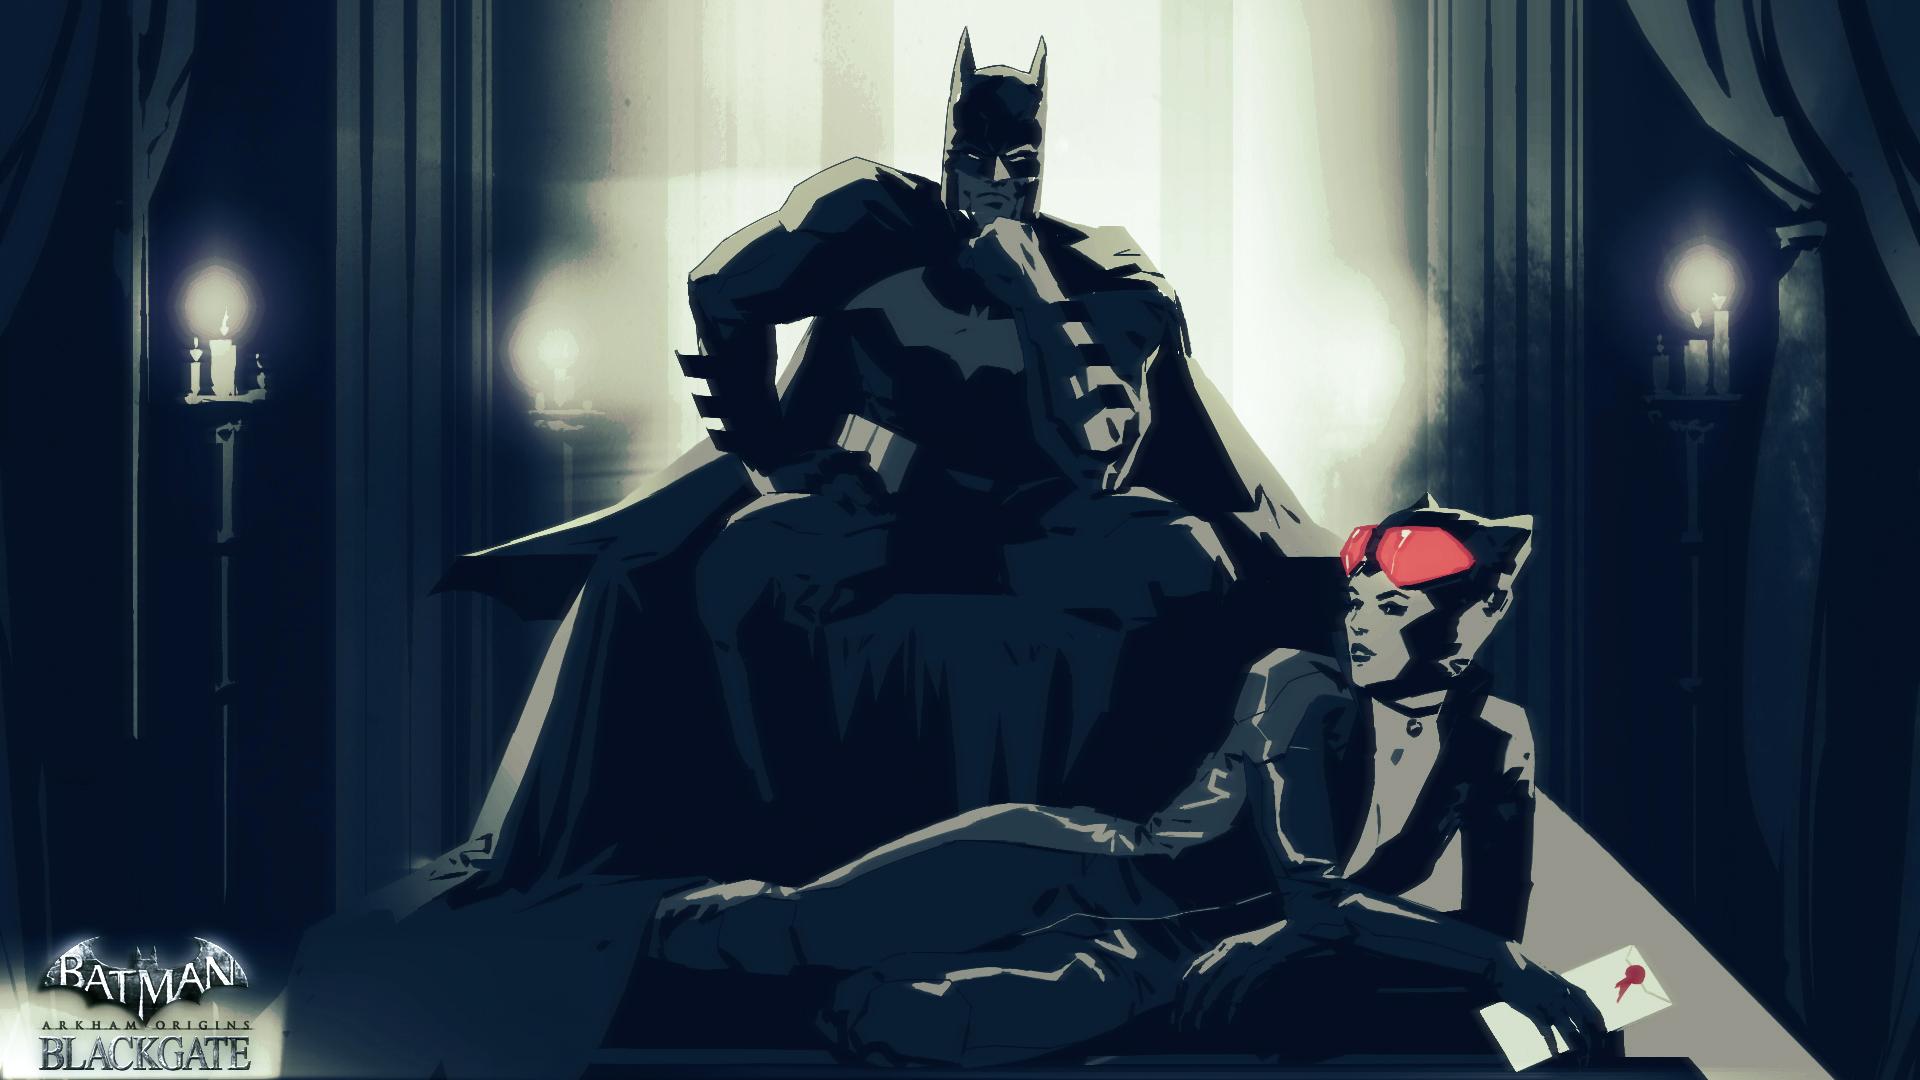 Batman-Arkham-Origins-Blackgate-wallpapers-feature-pensive-Batman-sexy-Catwoman-1